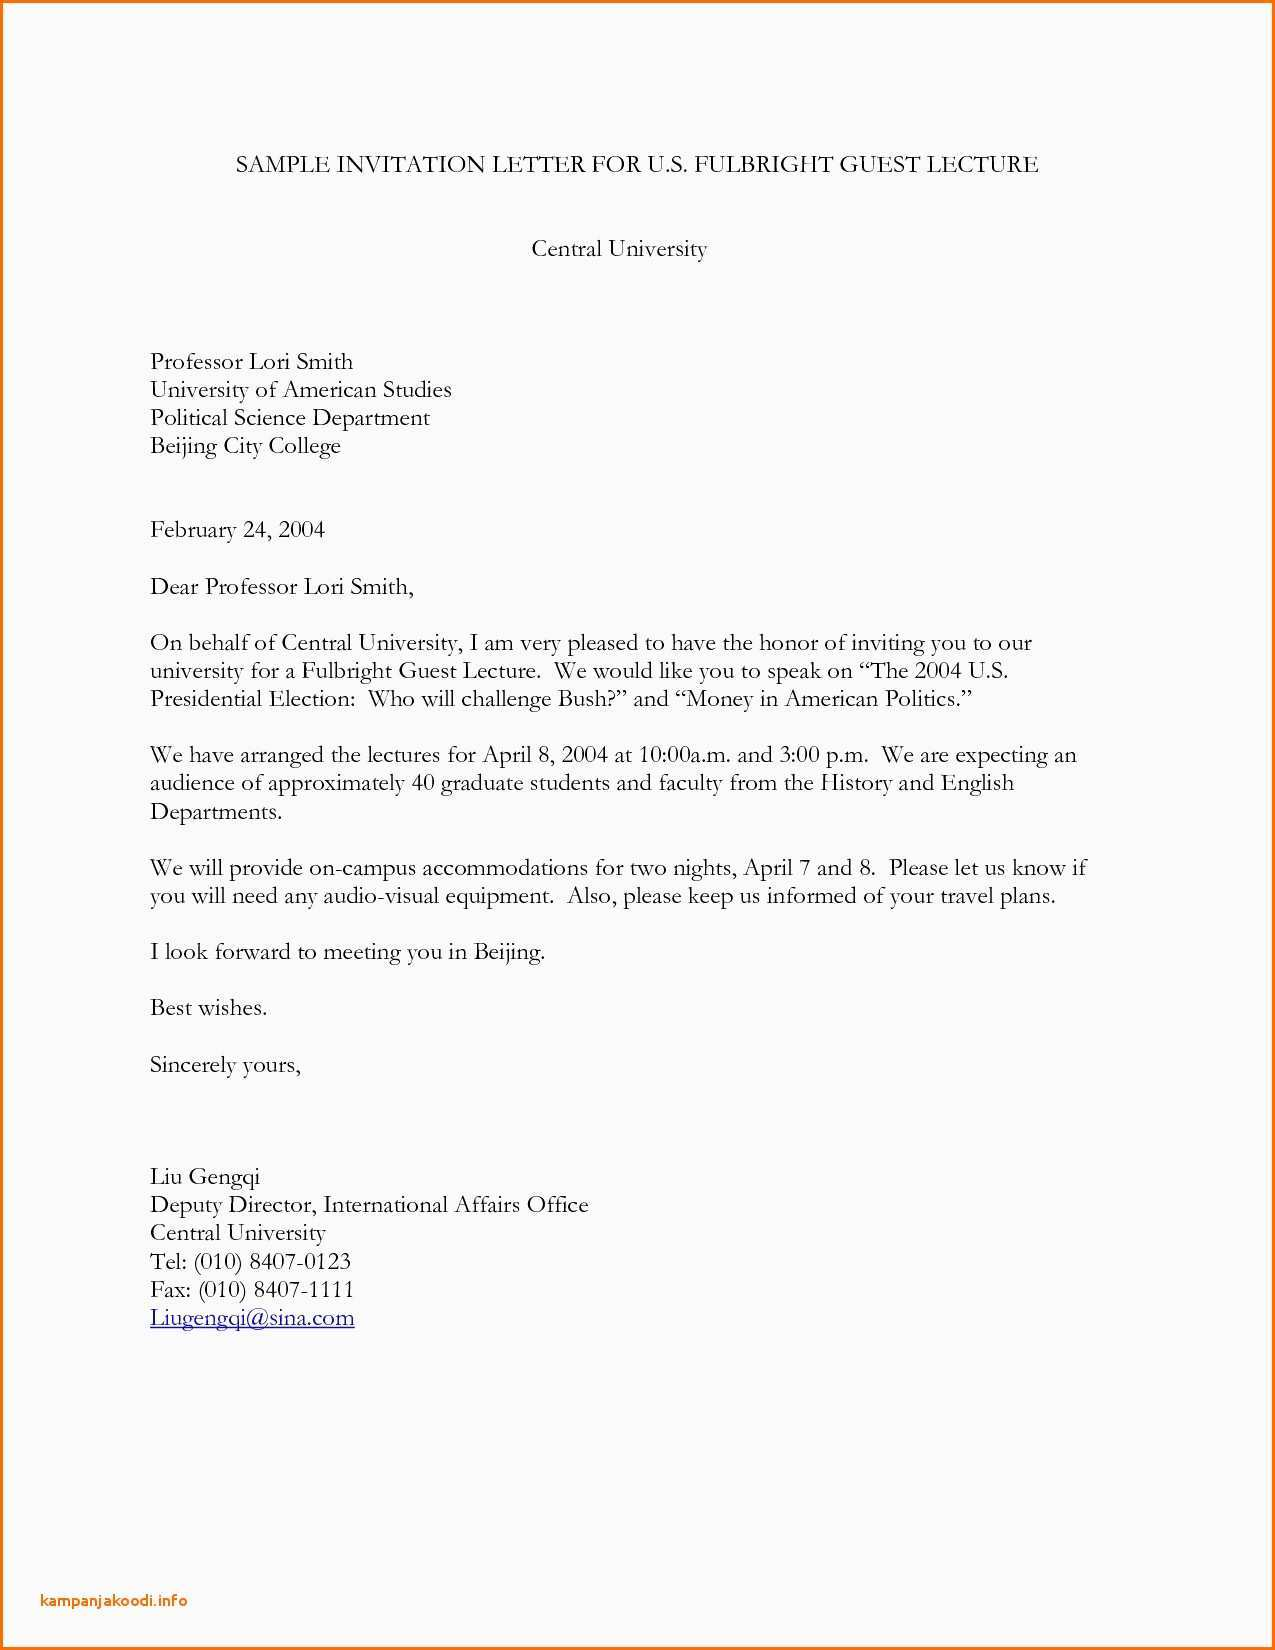 98 Create Formal Conference Invitation Letter Template Psd File By Formal Conference Invitation Letter Template Cards Design Templates